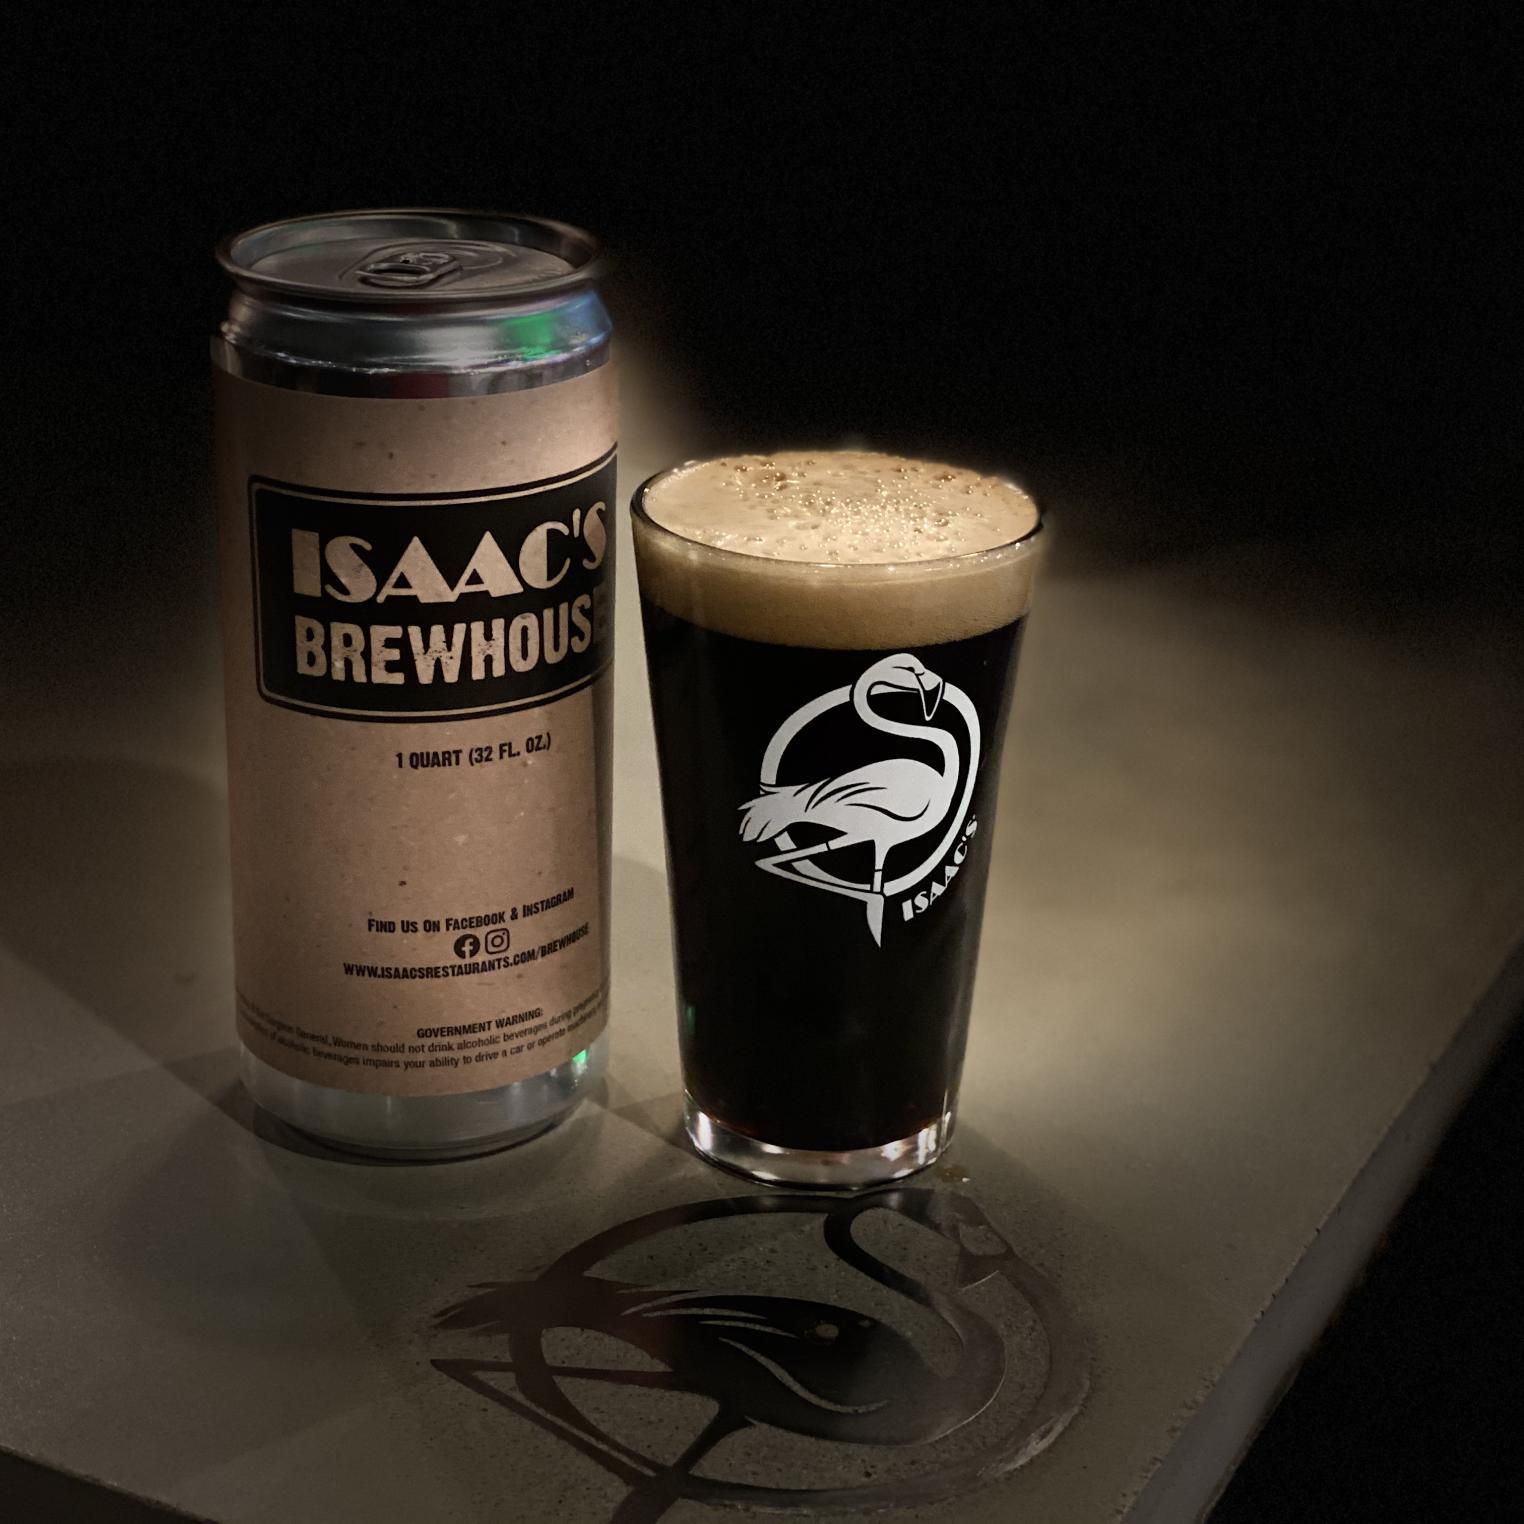 Isaac's Brewhouse